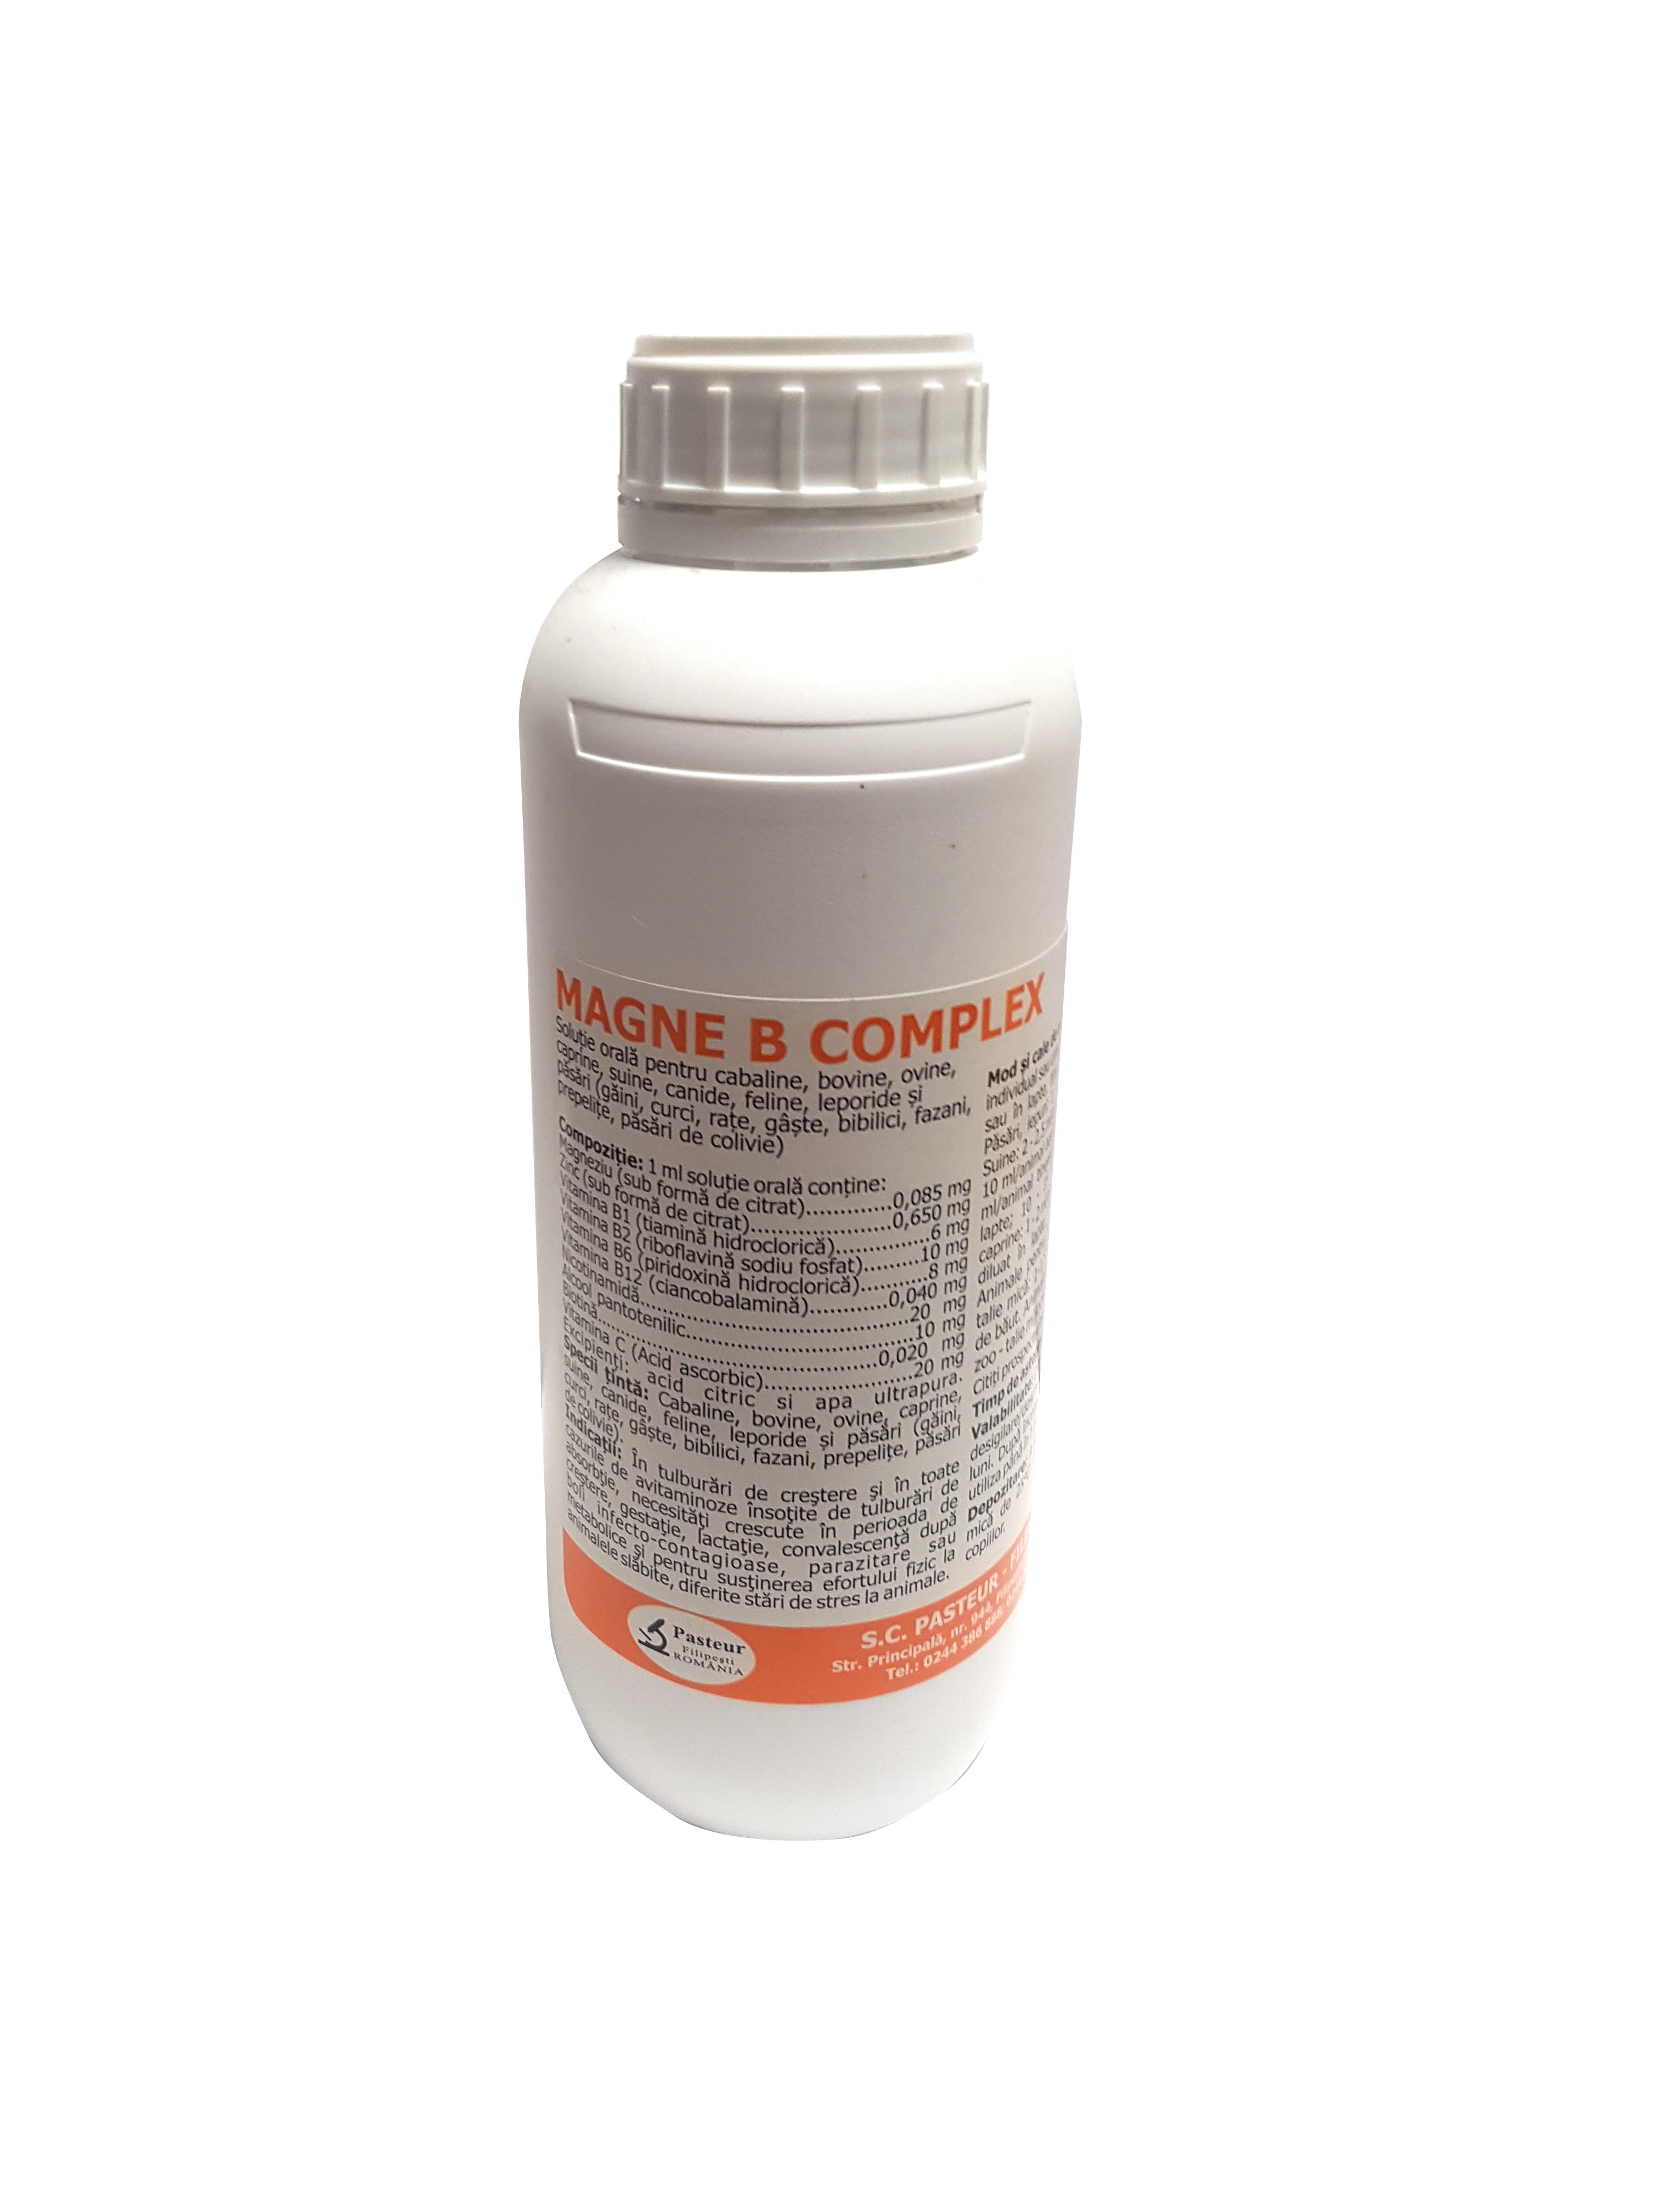 Complex de vitamina B pentru animale, Magne B Complex, Pasteur, 1L 1